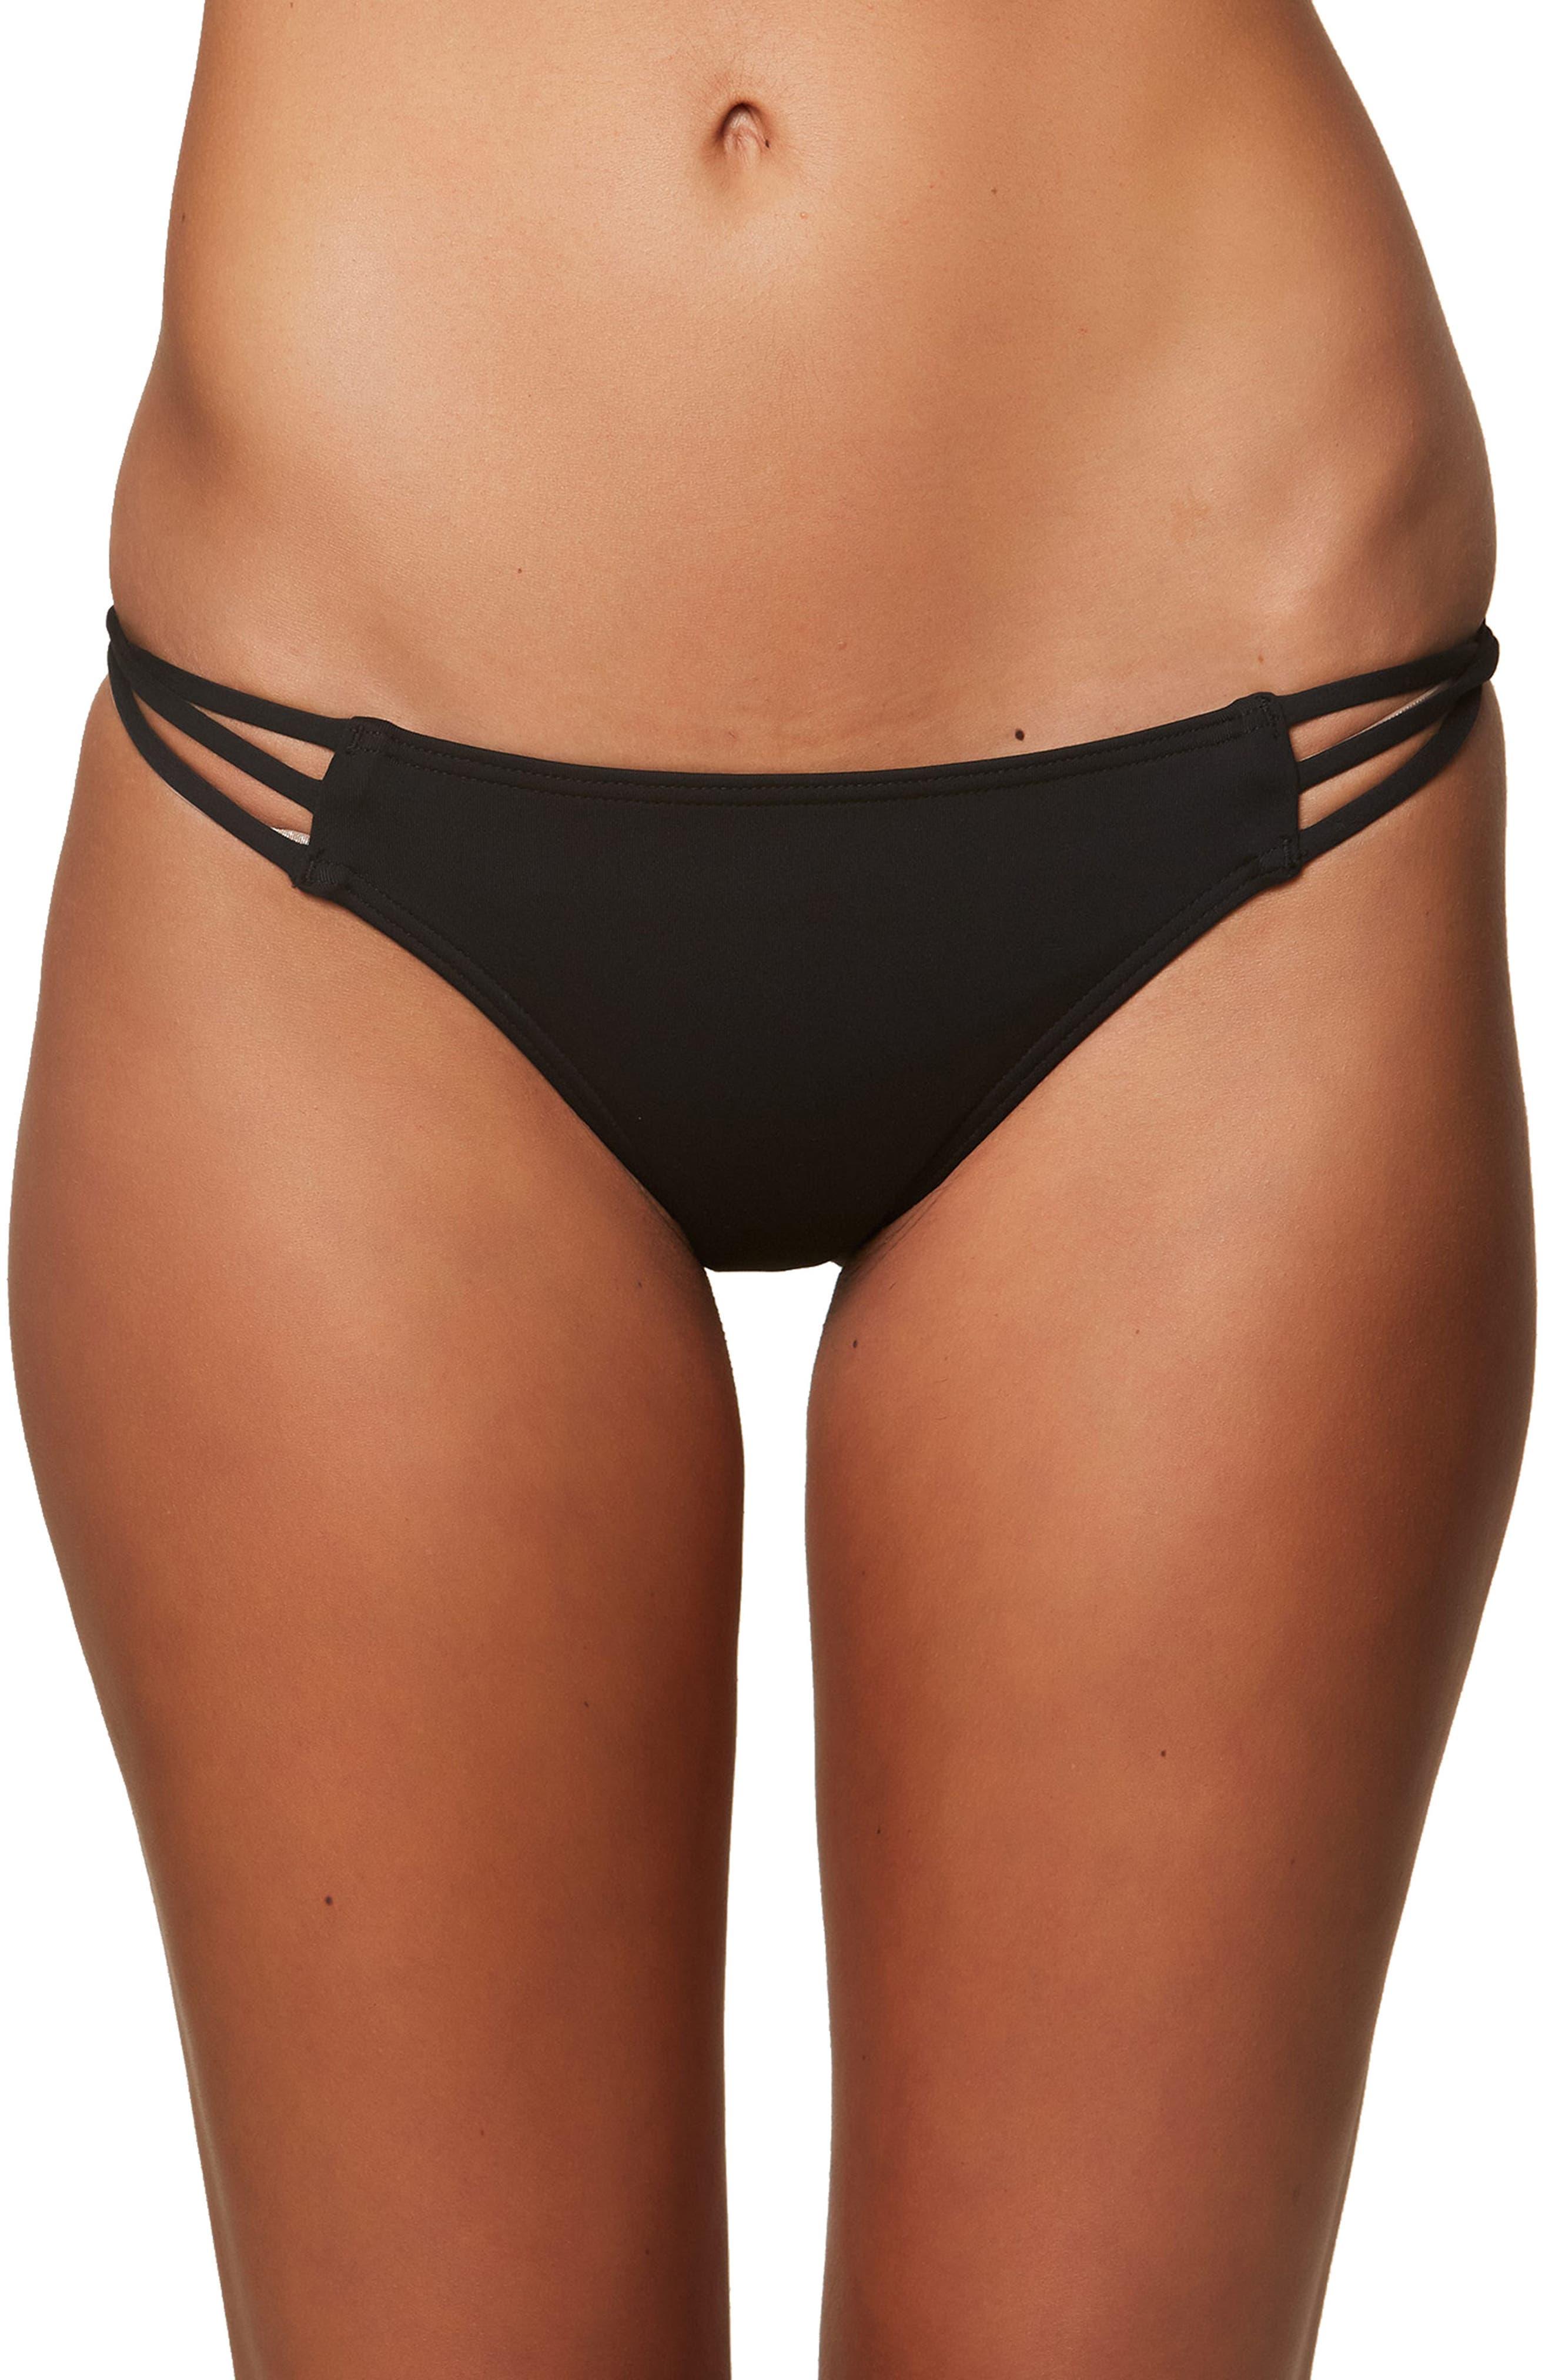 Salt Water Solids Strappy Bikini Bottoms,                         Main,                         color, BLACK